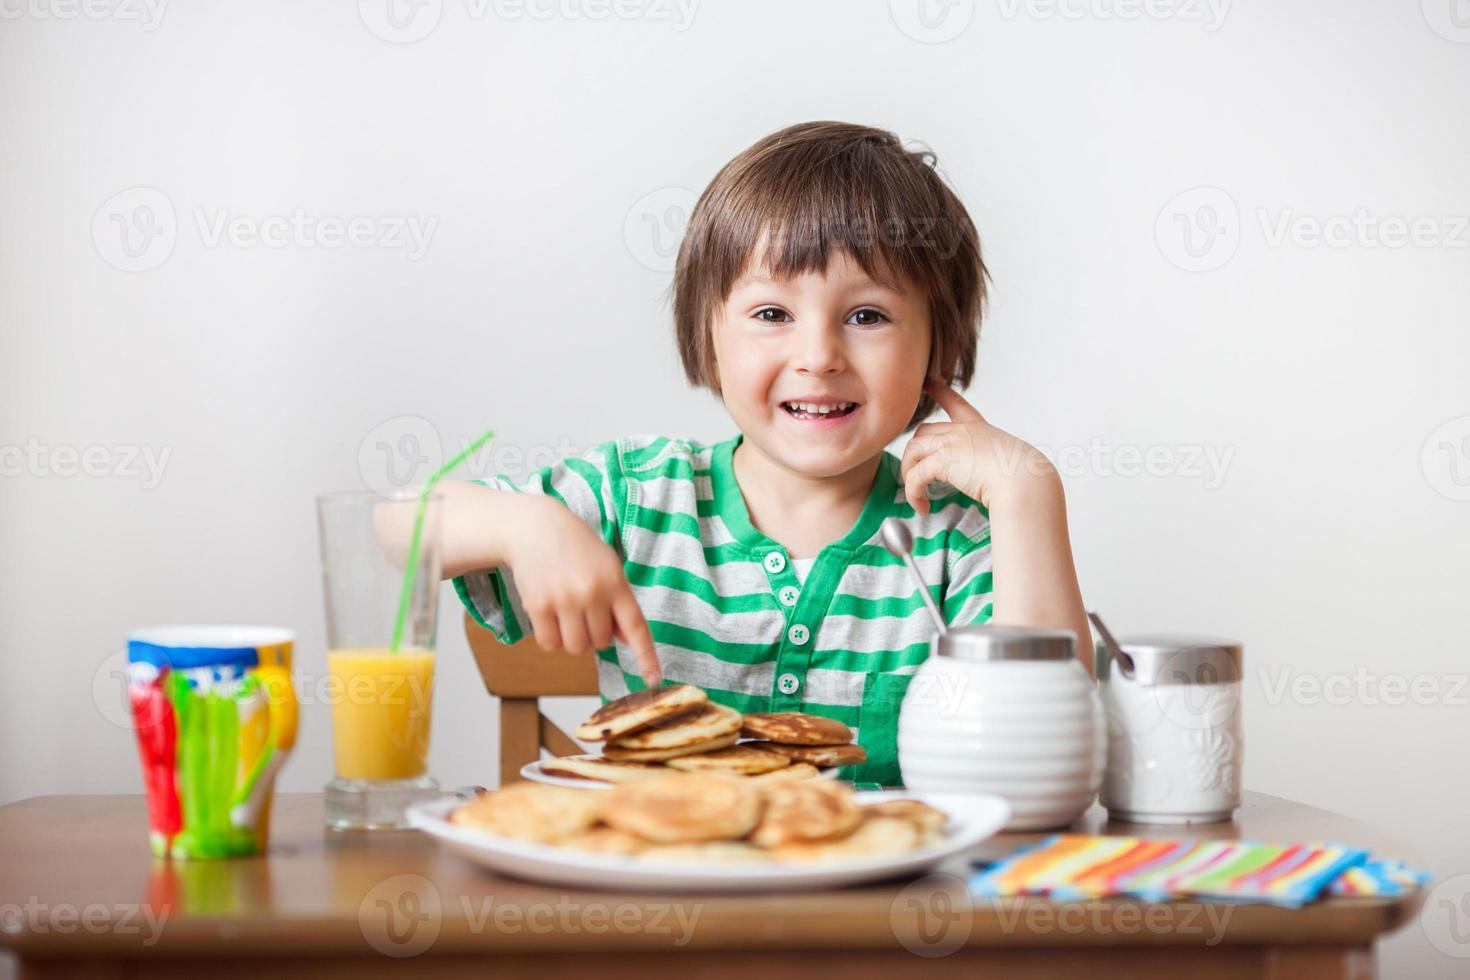 dolce ragazzino caucasico, mangiando frittelle foto